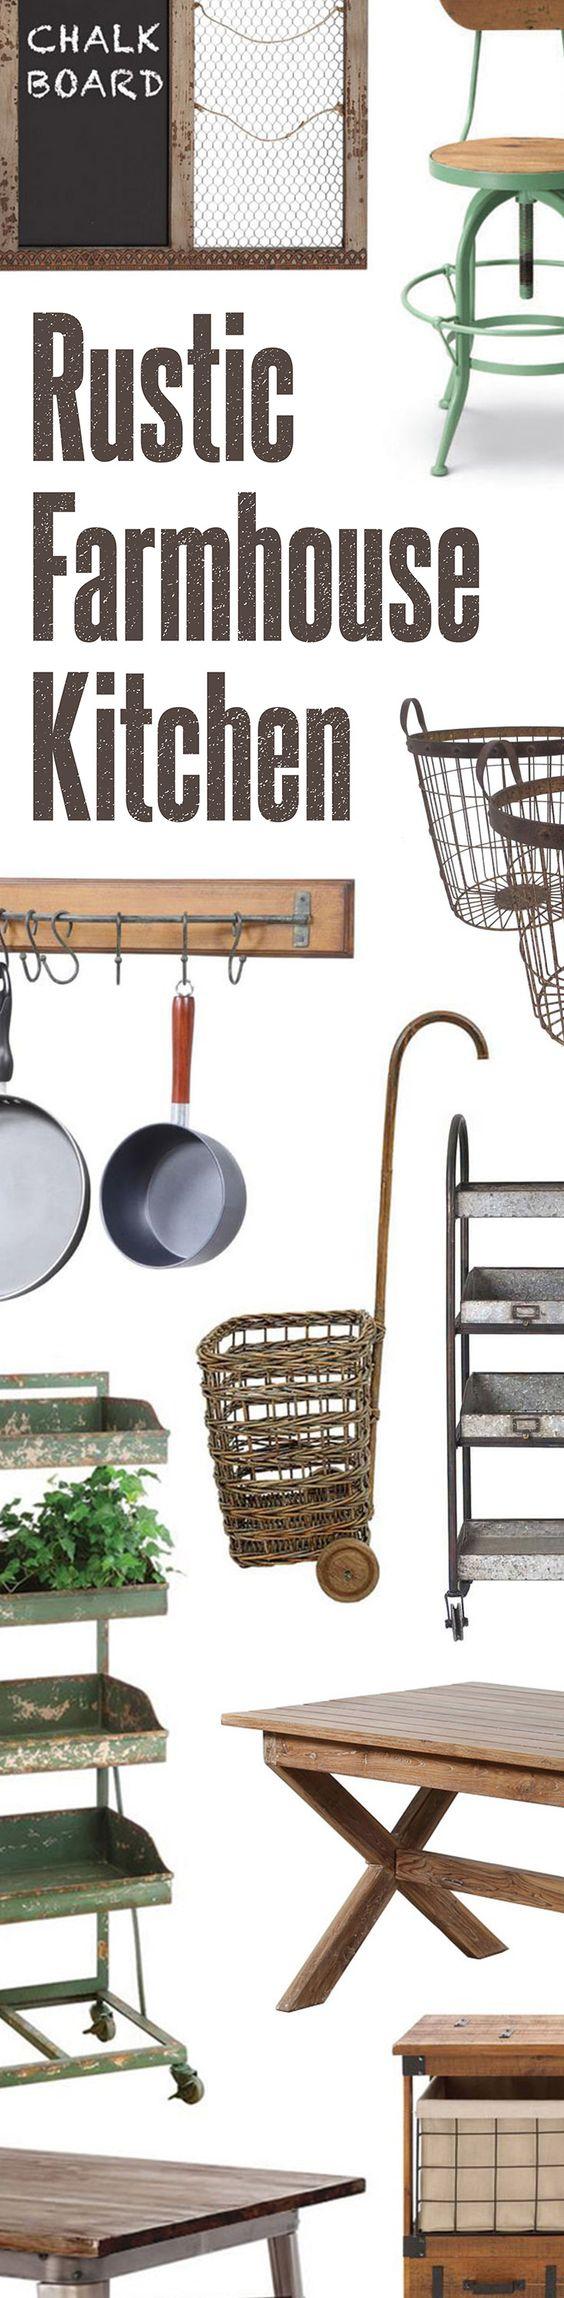 Cuisines rustiques, rustique and cuisines on pinterest